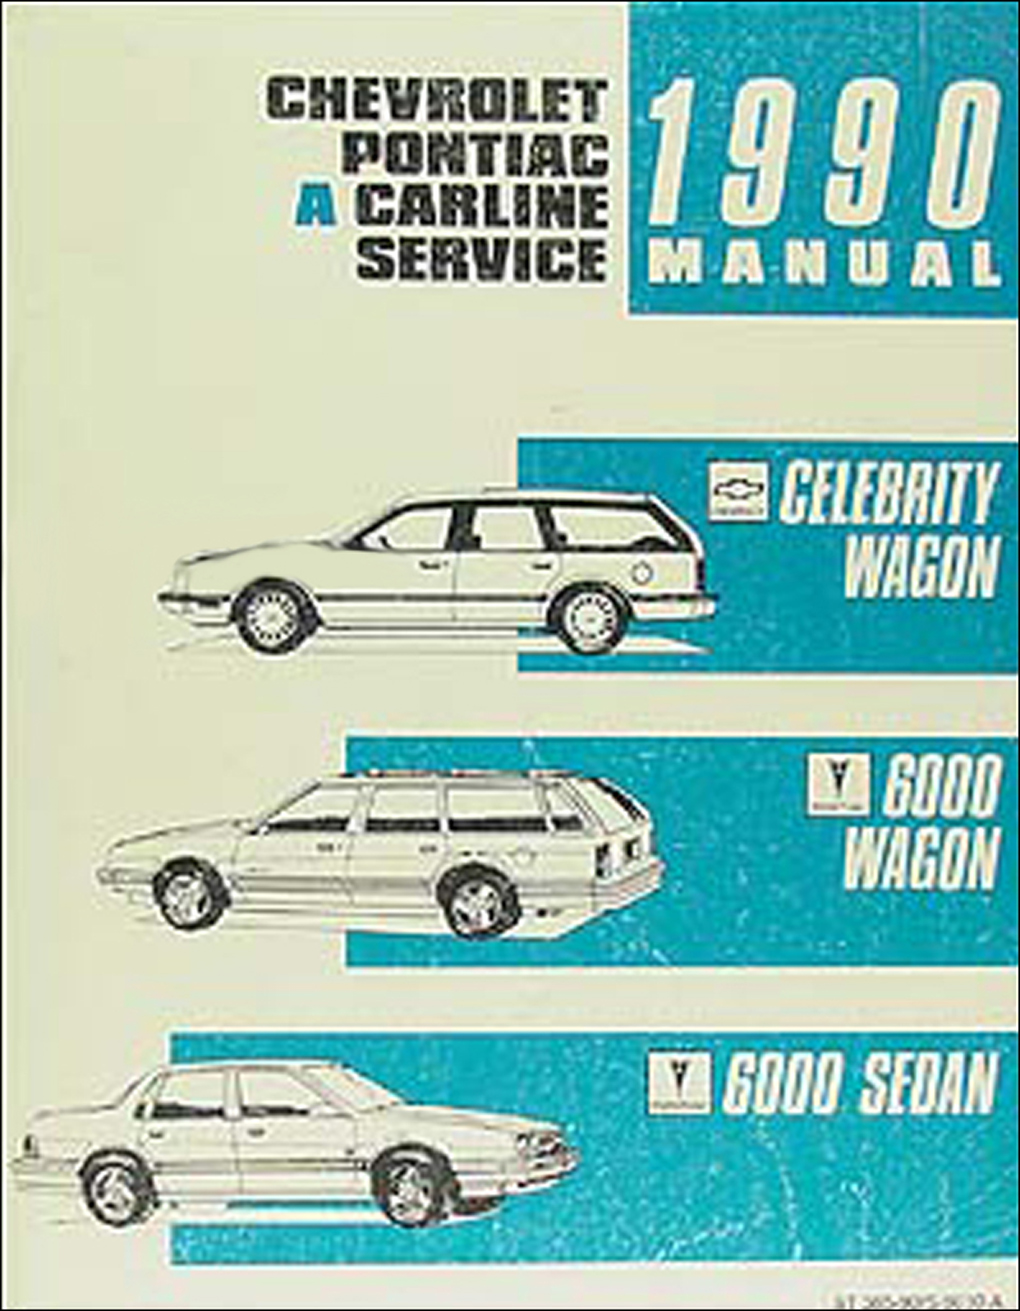 1990 Celebrity Wagon & 6000 Shop Manual Original